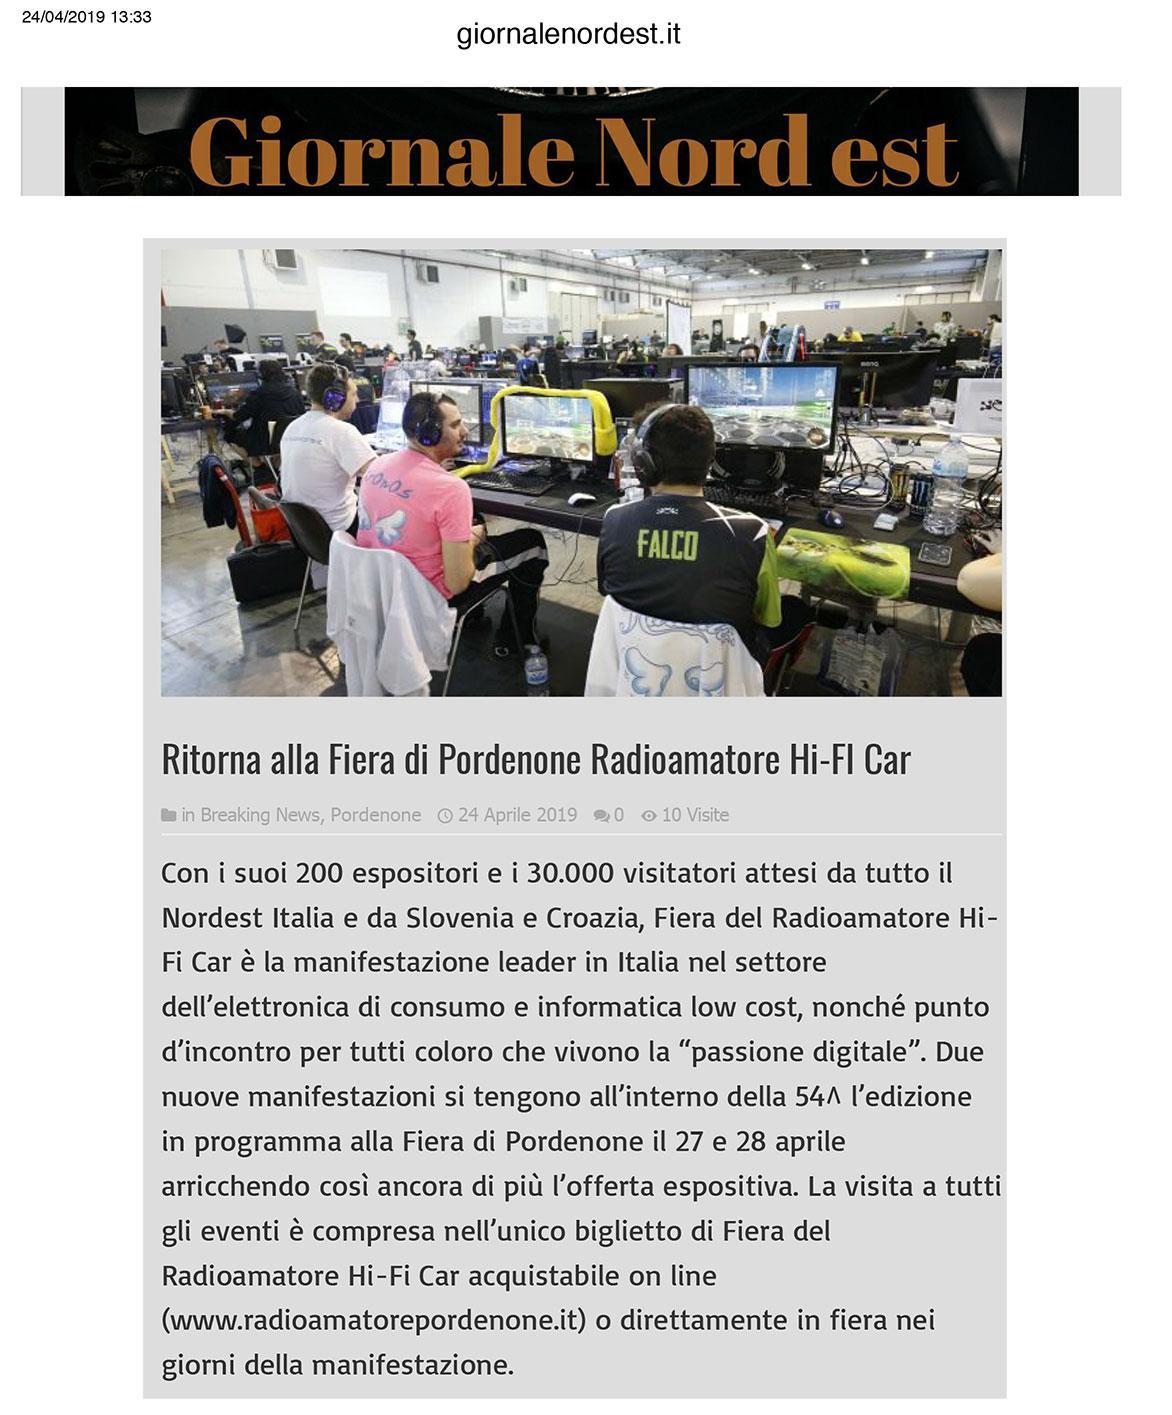 GiornaleNordEst 24052019 Rassegna Stampa Radioamatore Fiera 2019